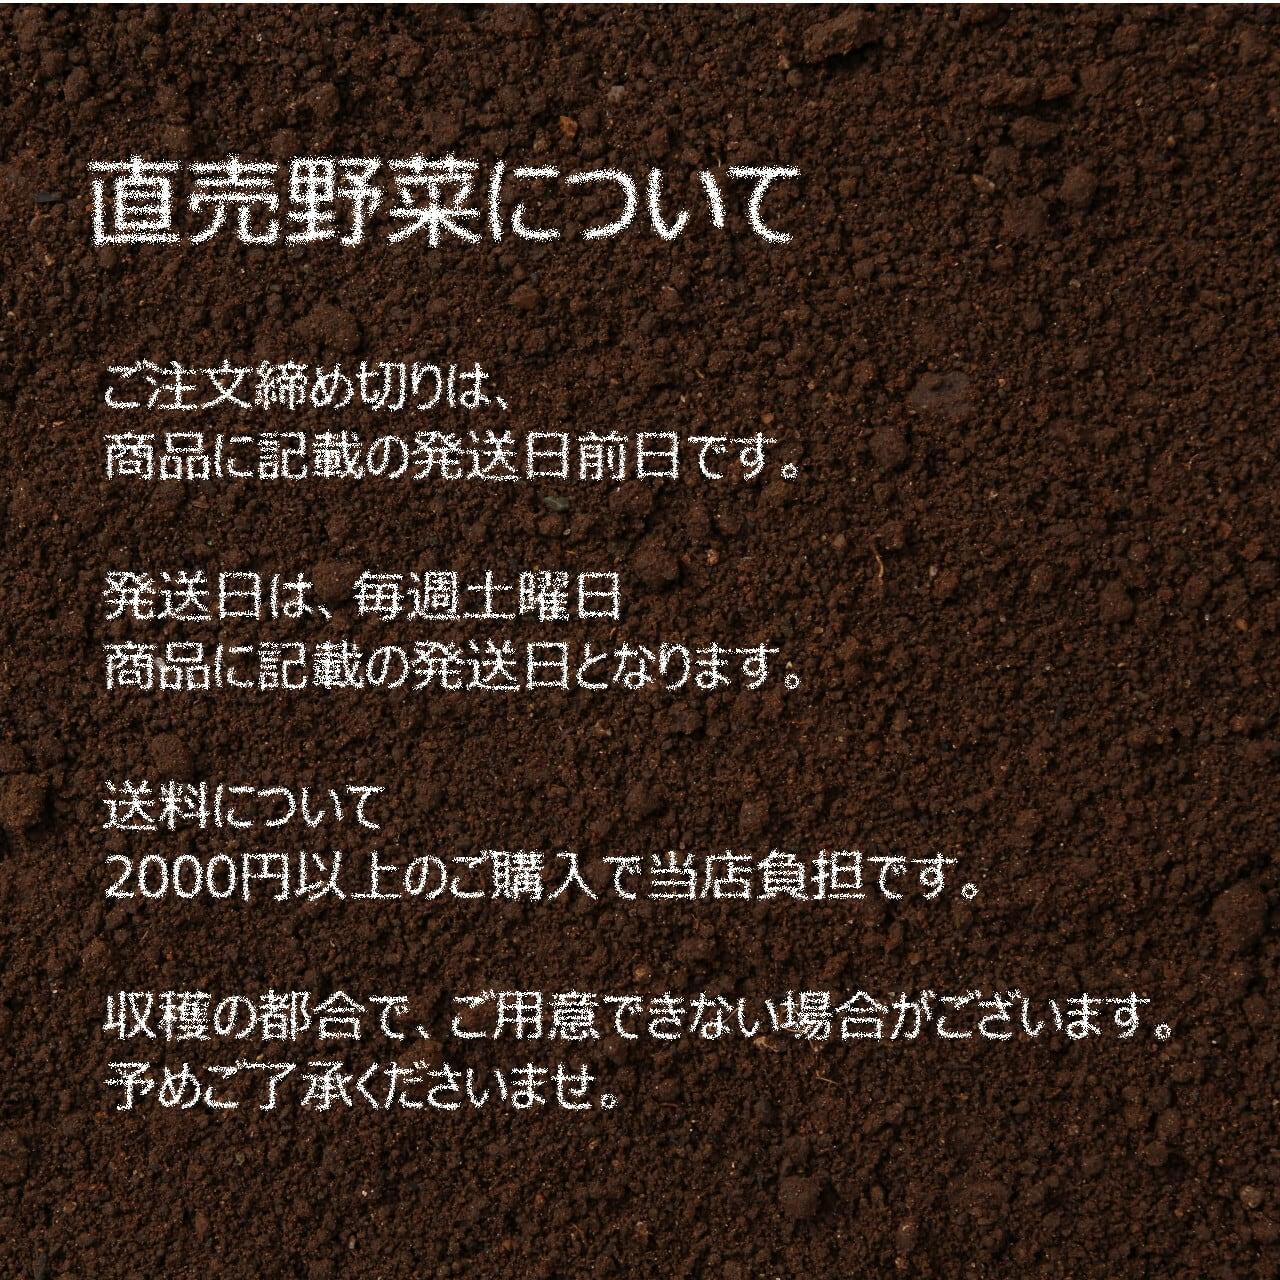 春の新鮮野菜 春菊 約200g : 5月の朝採り直売野菜 5月29日発送予定